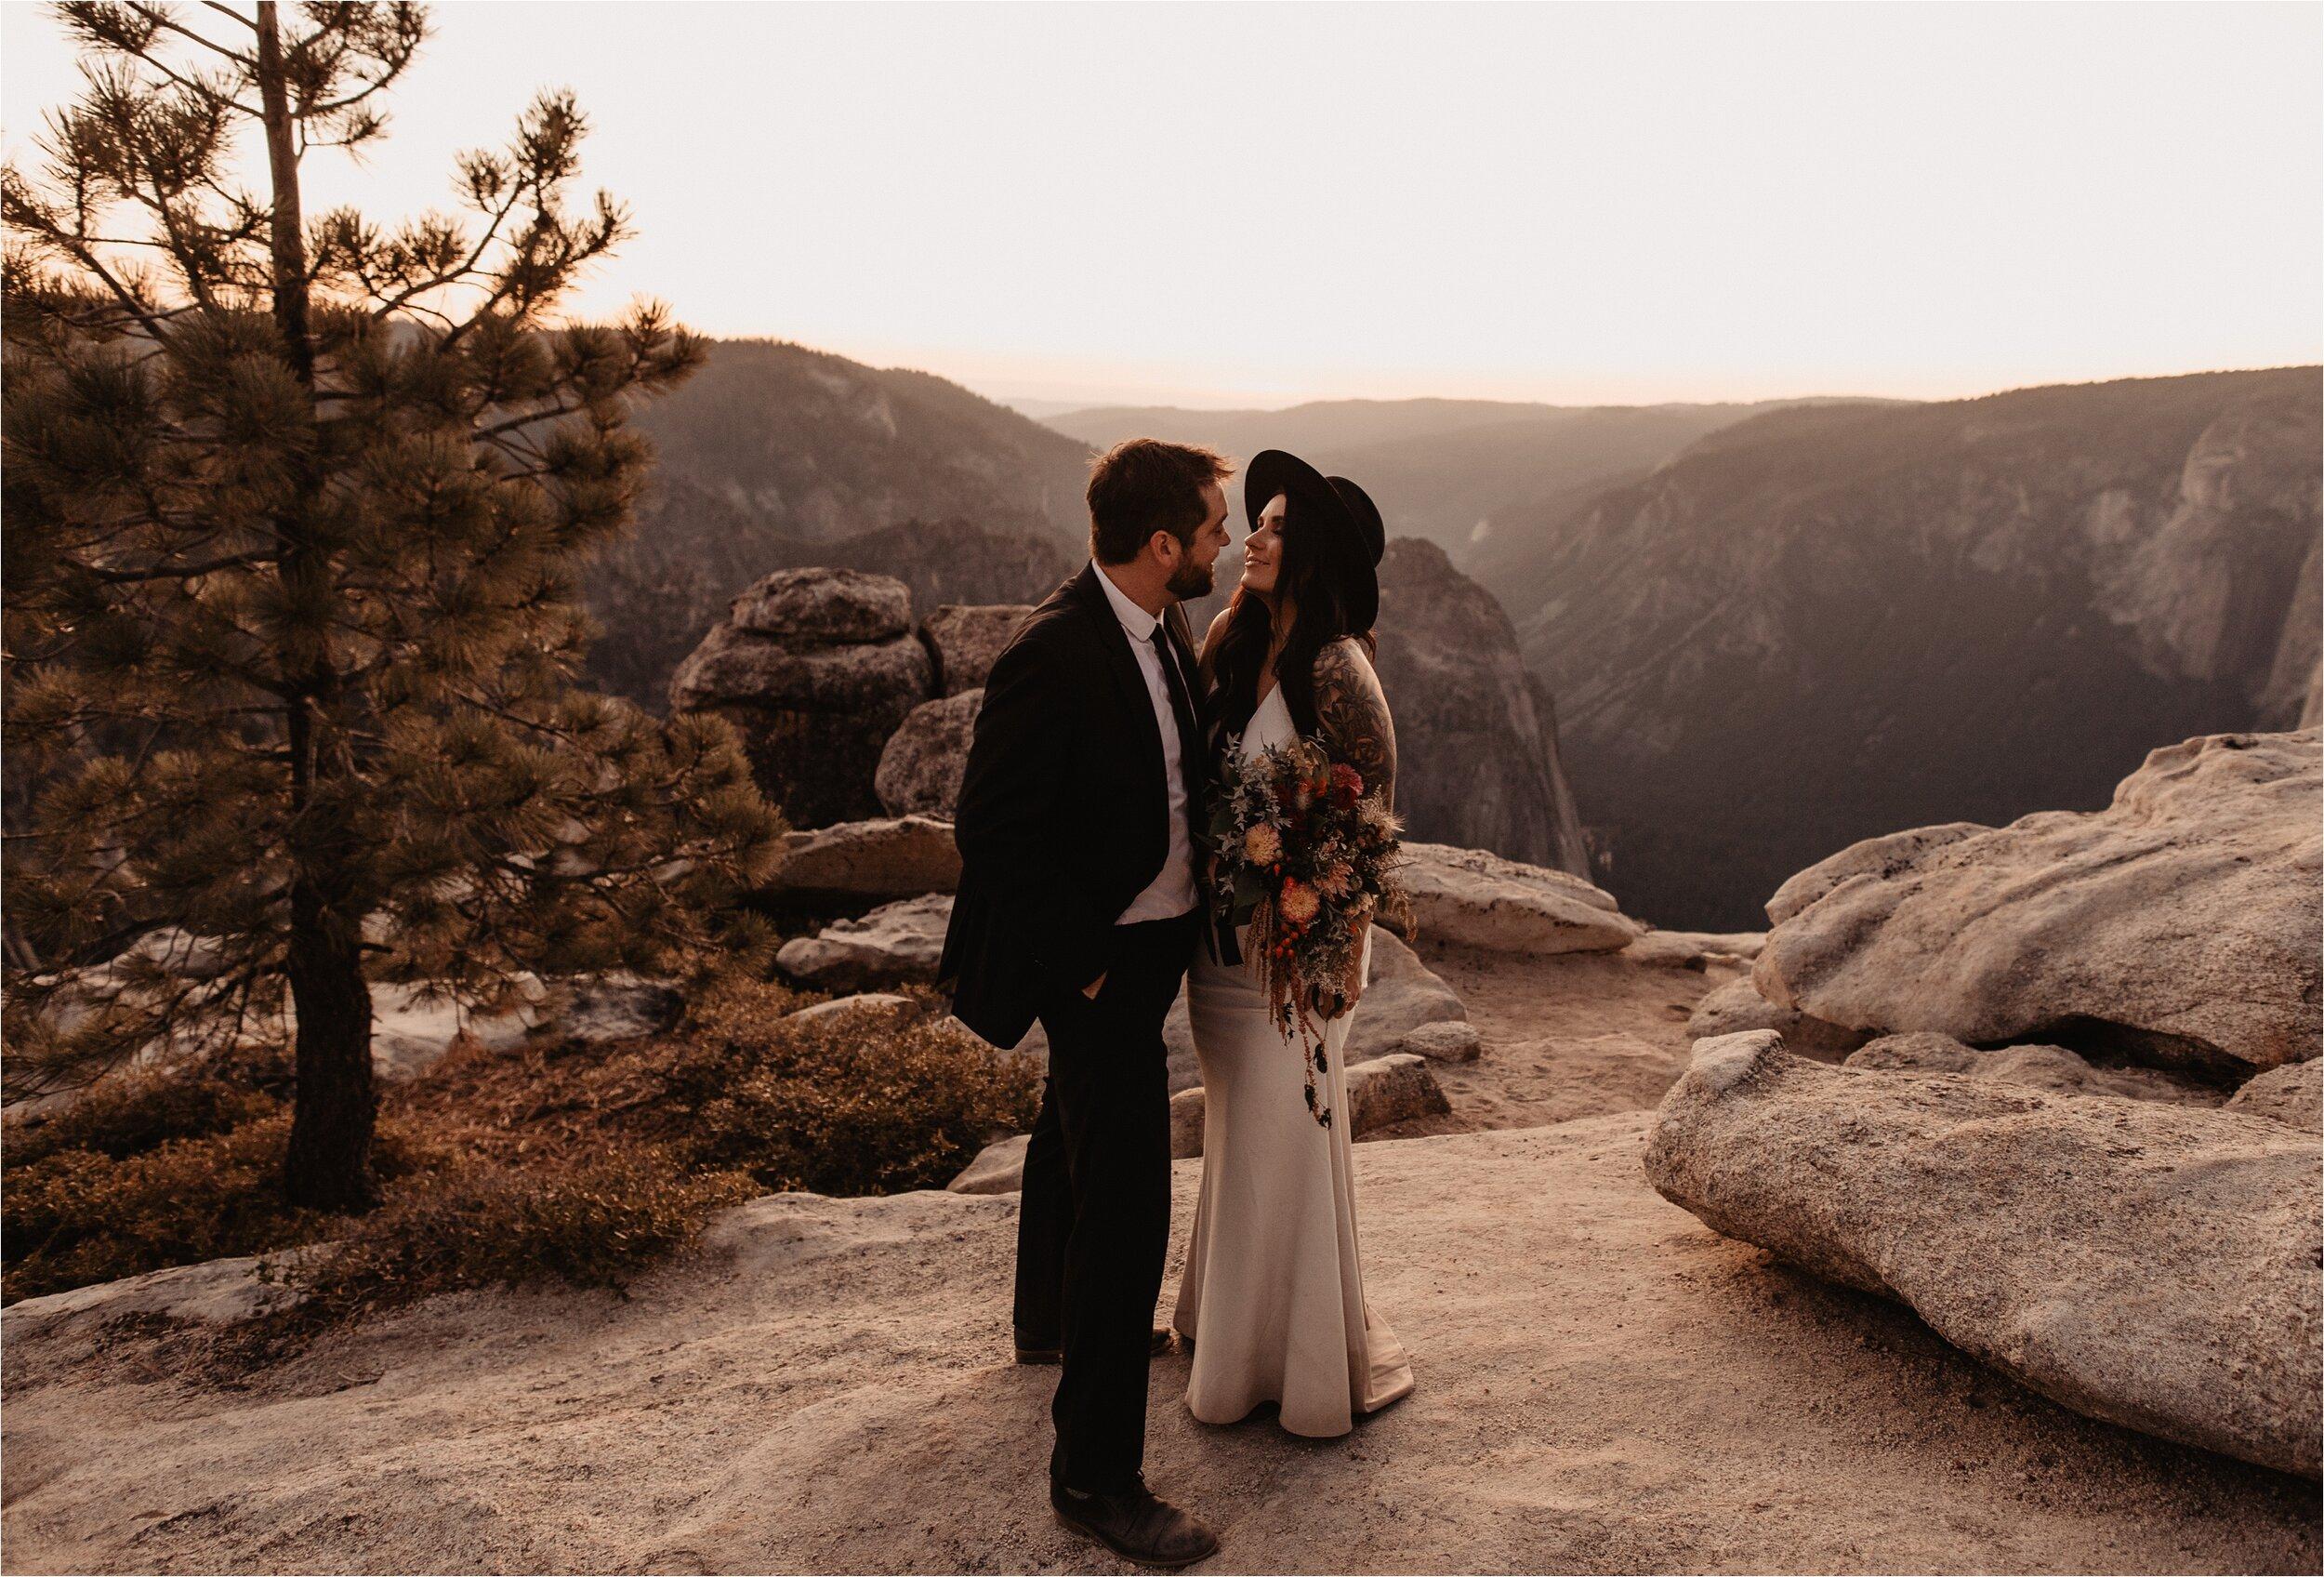 glacier-point-yosemite-elopement-ceremony_0089.jpg